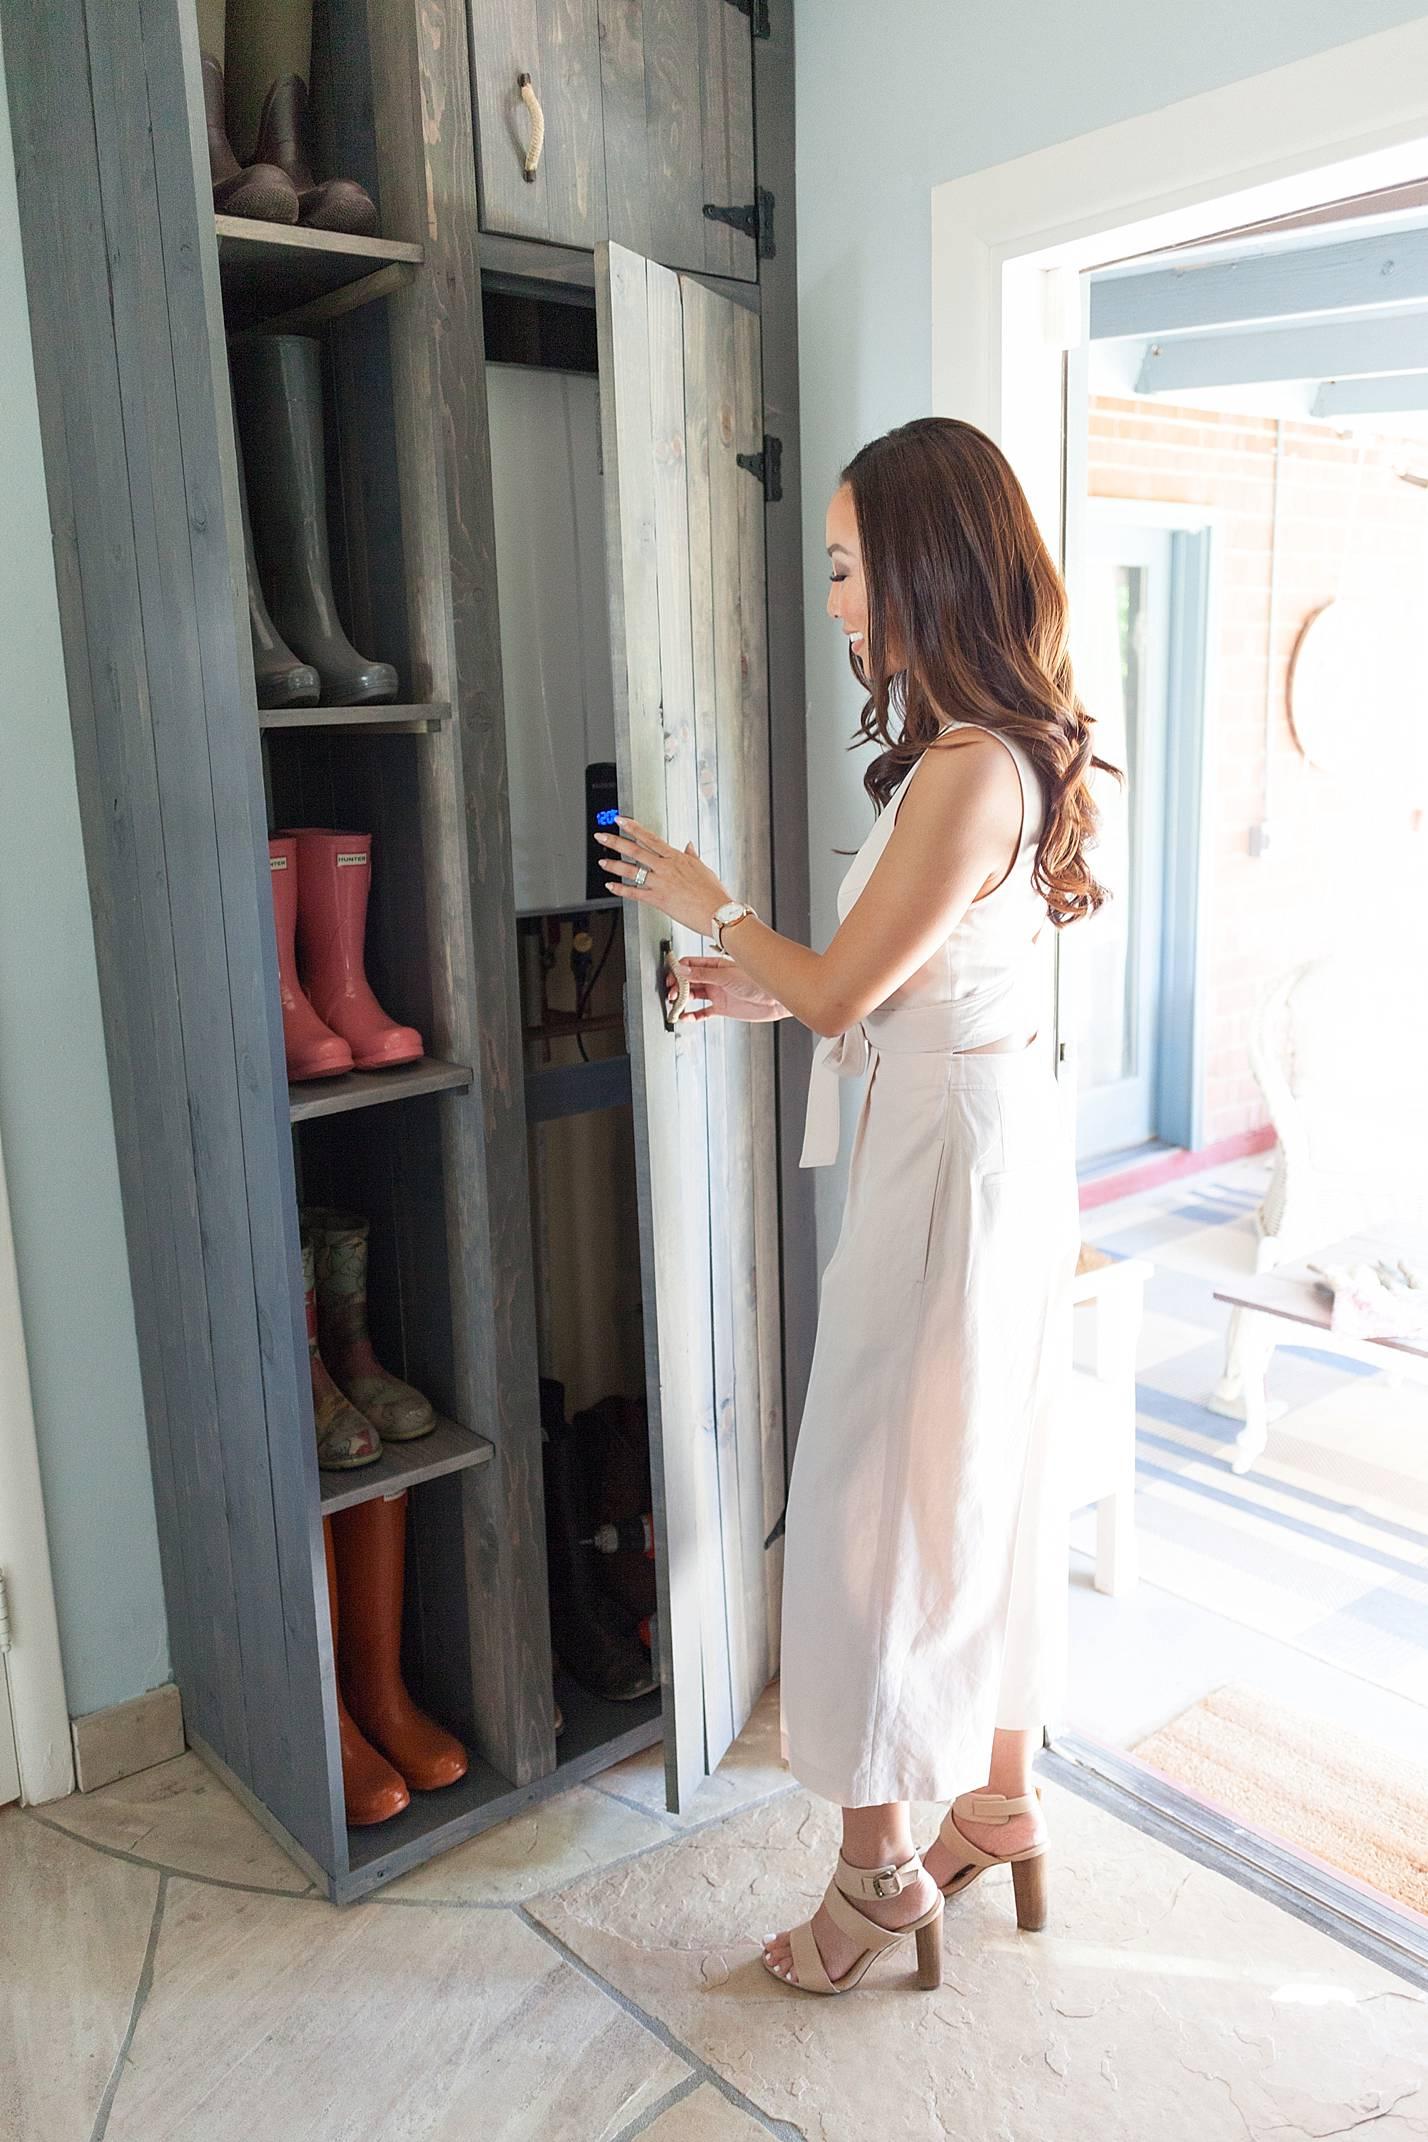 custom cabinet to reveal hidden tankless water heater in mudroom laundry room hide